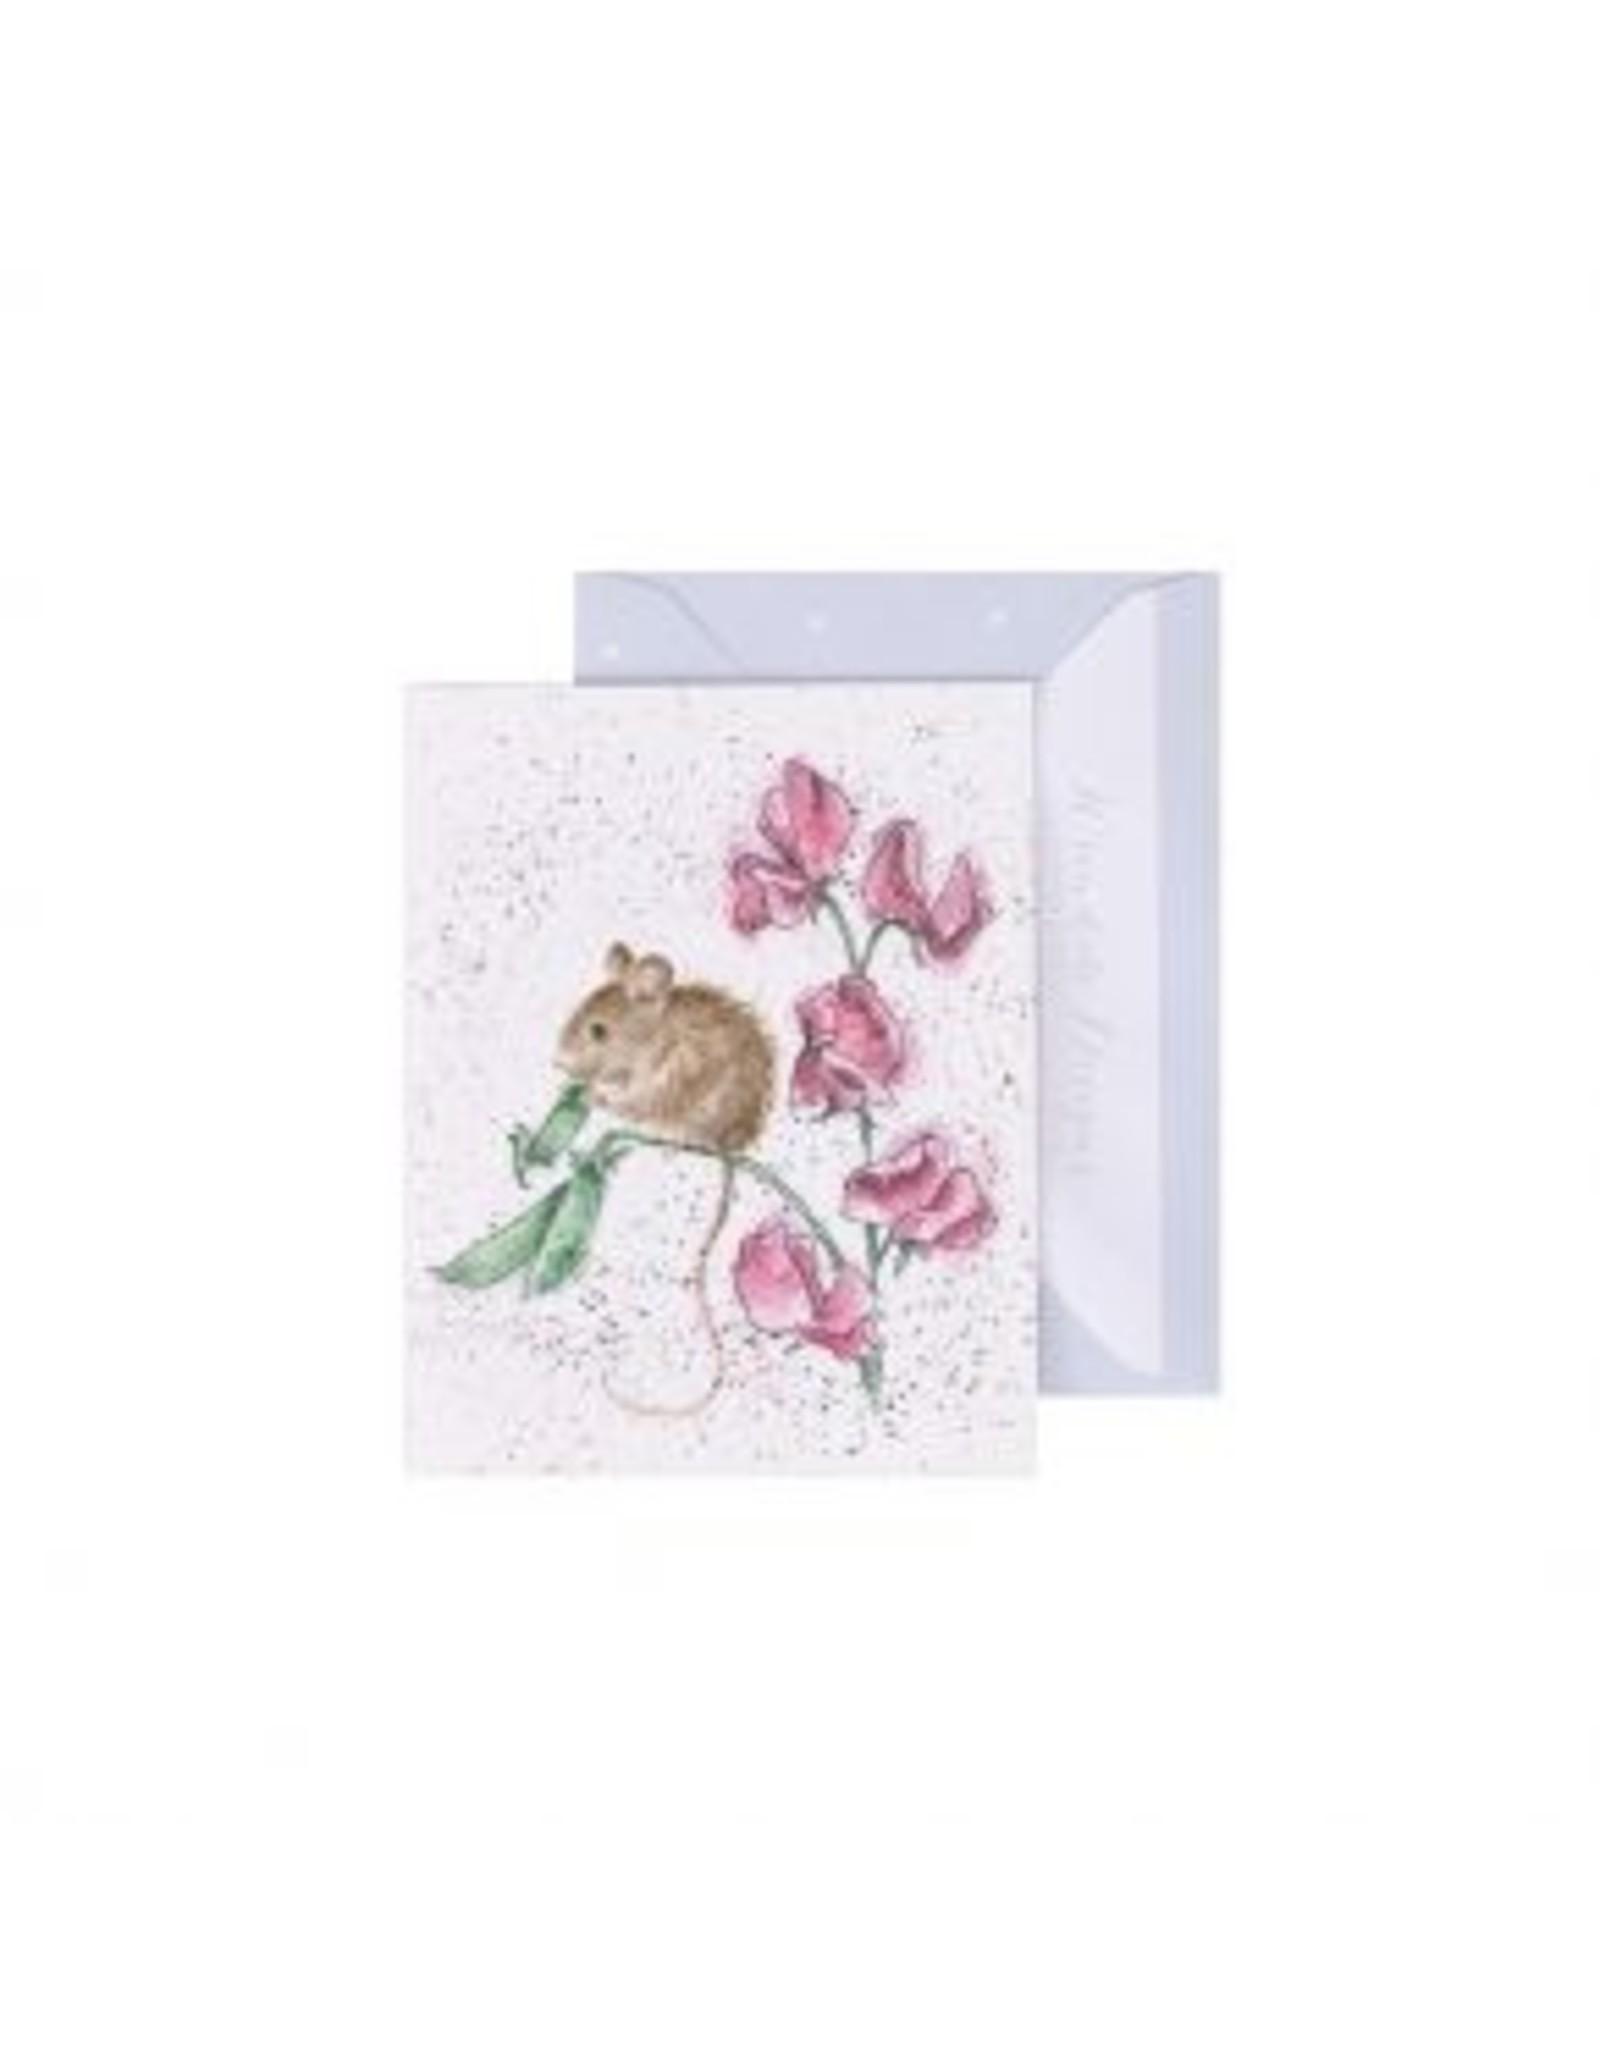 Wrendale Designs Miniature Card -  The Pea Thief